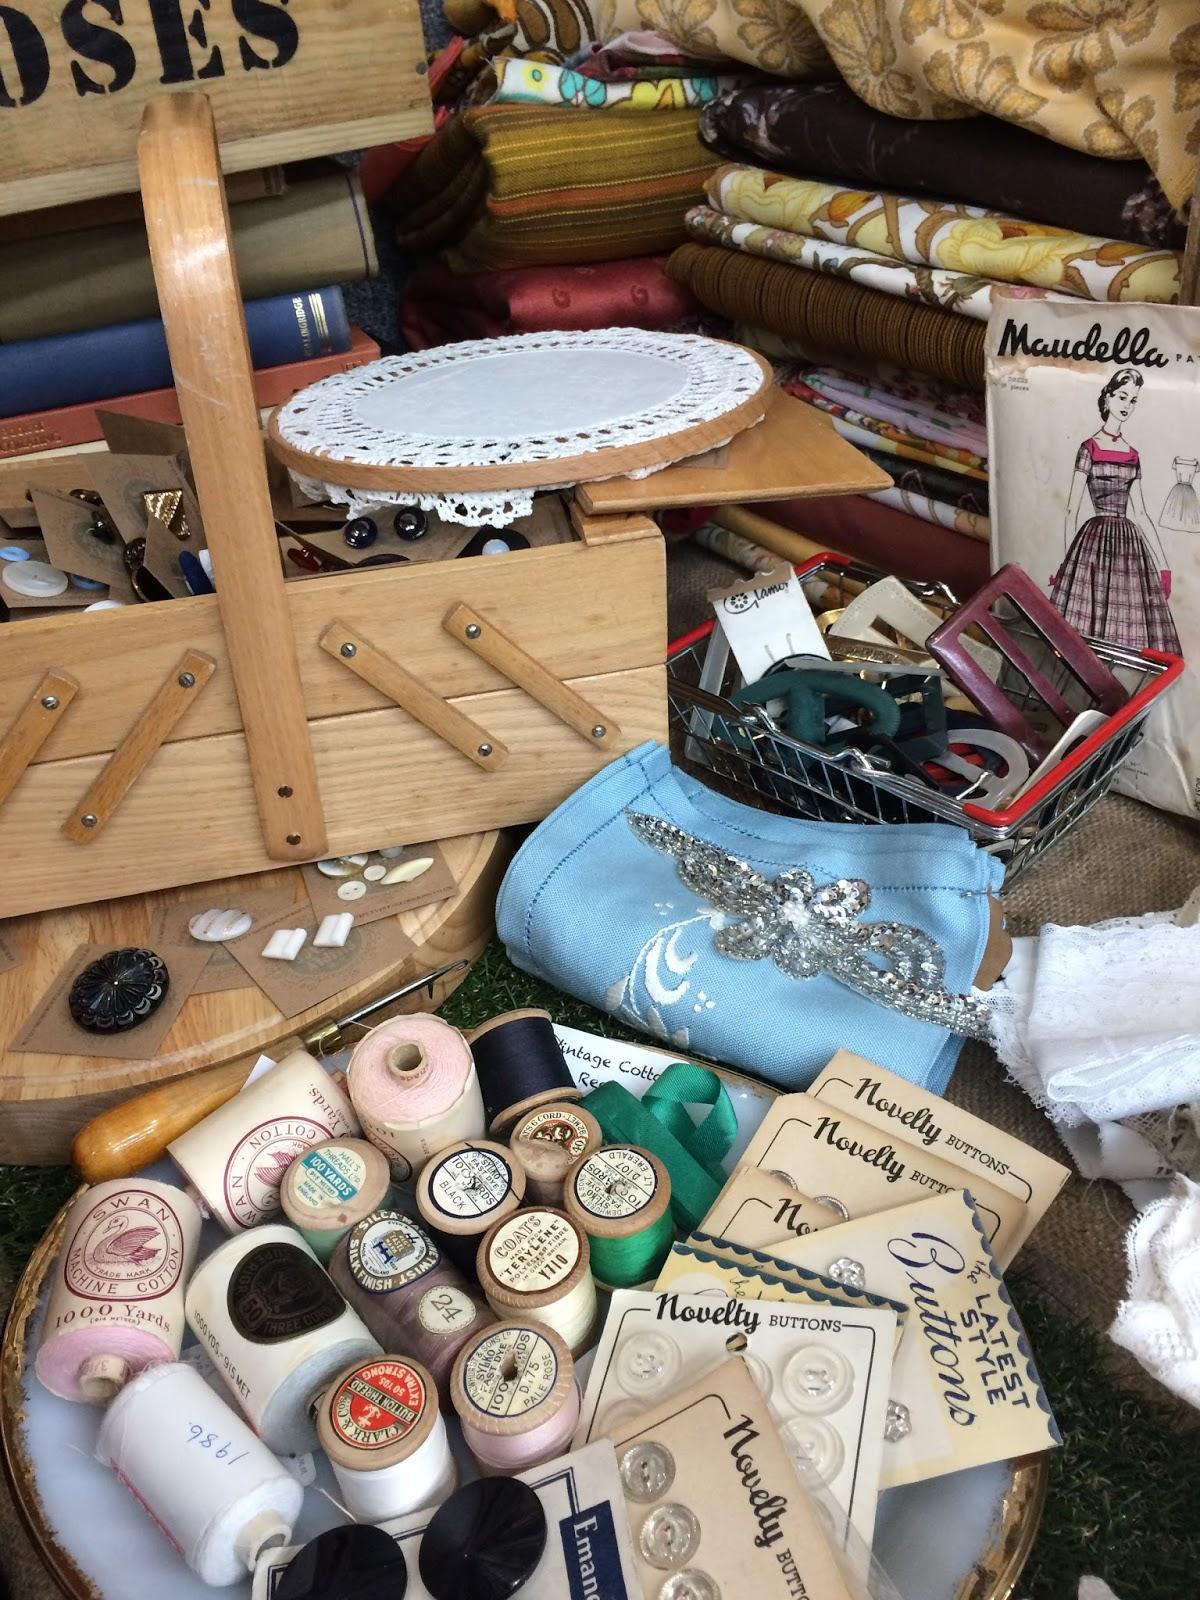 Knitting And Stitching Show Belfast 2017 : Handmade Jane: Knitting & Stitching Show 2017